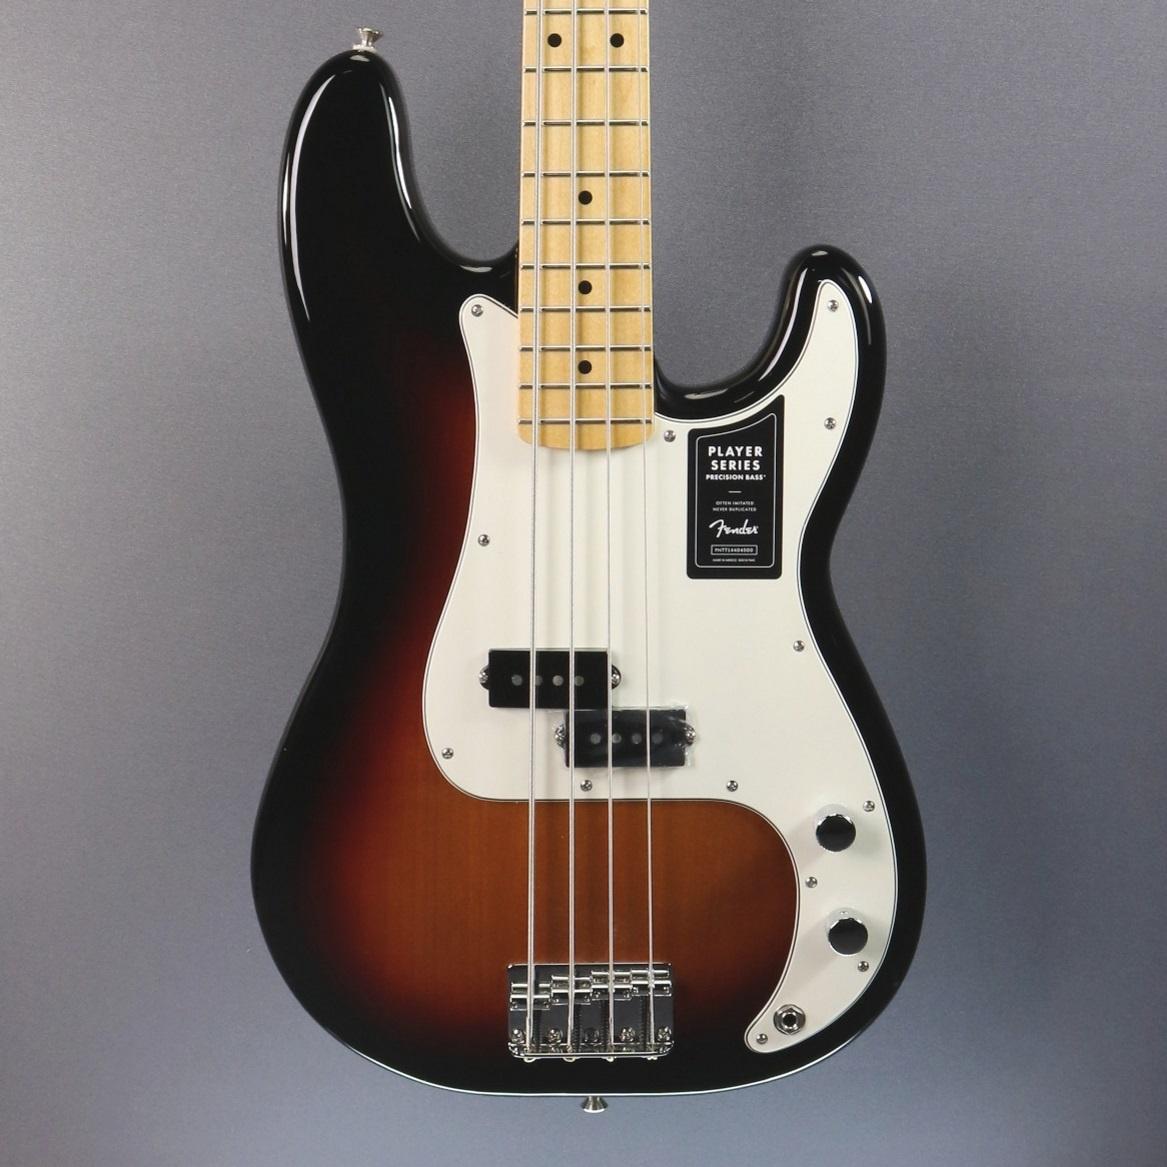 Fender DEMO Fender Player Precision Bass - 3-Color Sunburst (753)